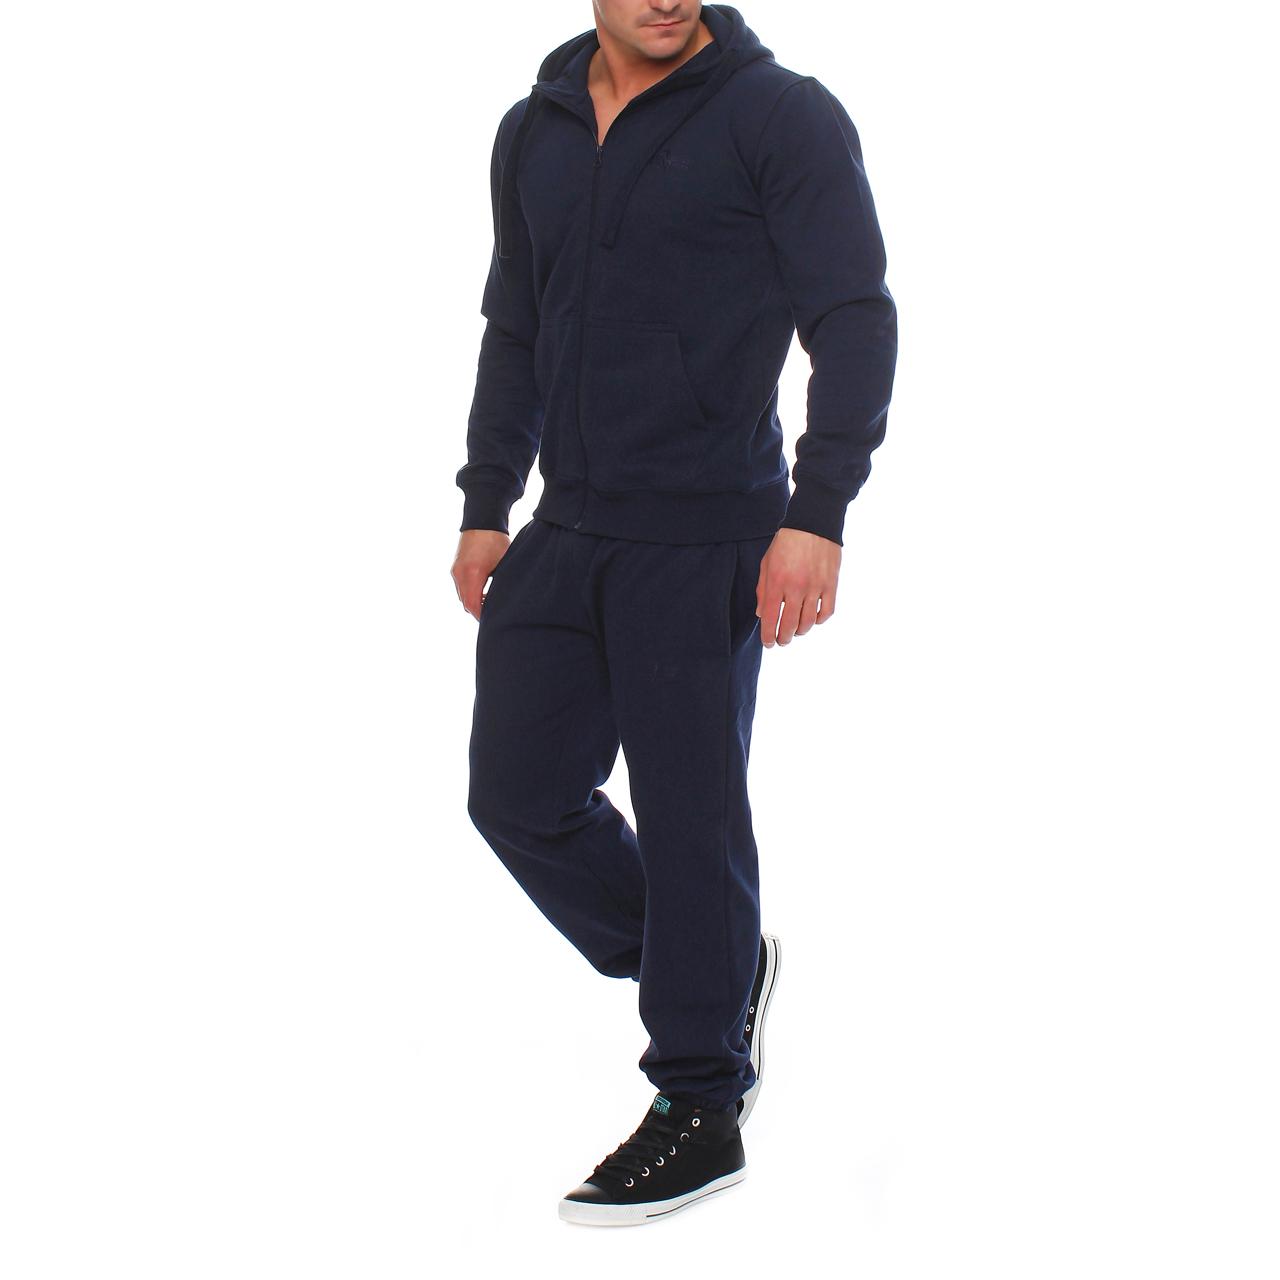 Finchman Finchsuit 1 Herren Jogging Anzug Trainingsanzug Sportanzug Fitness | eBay